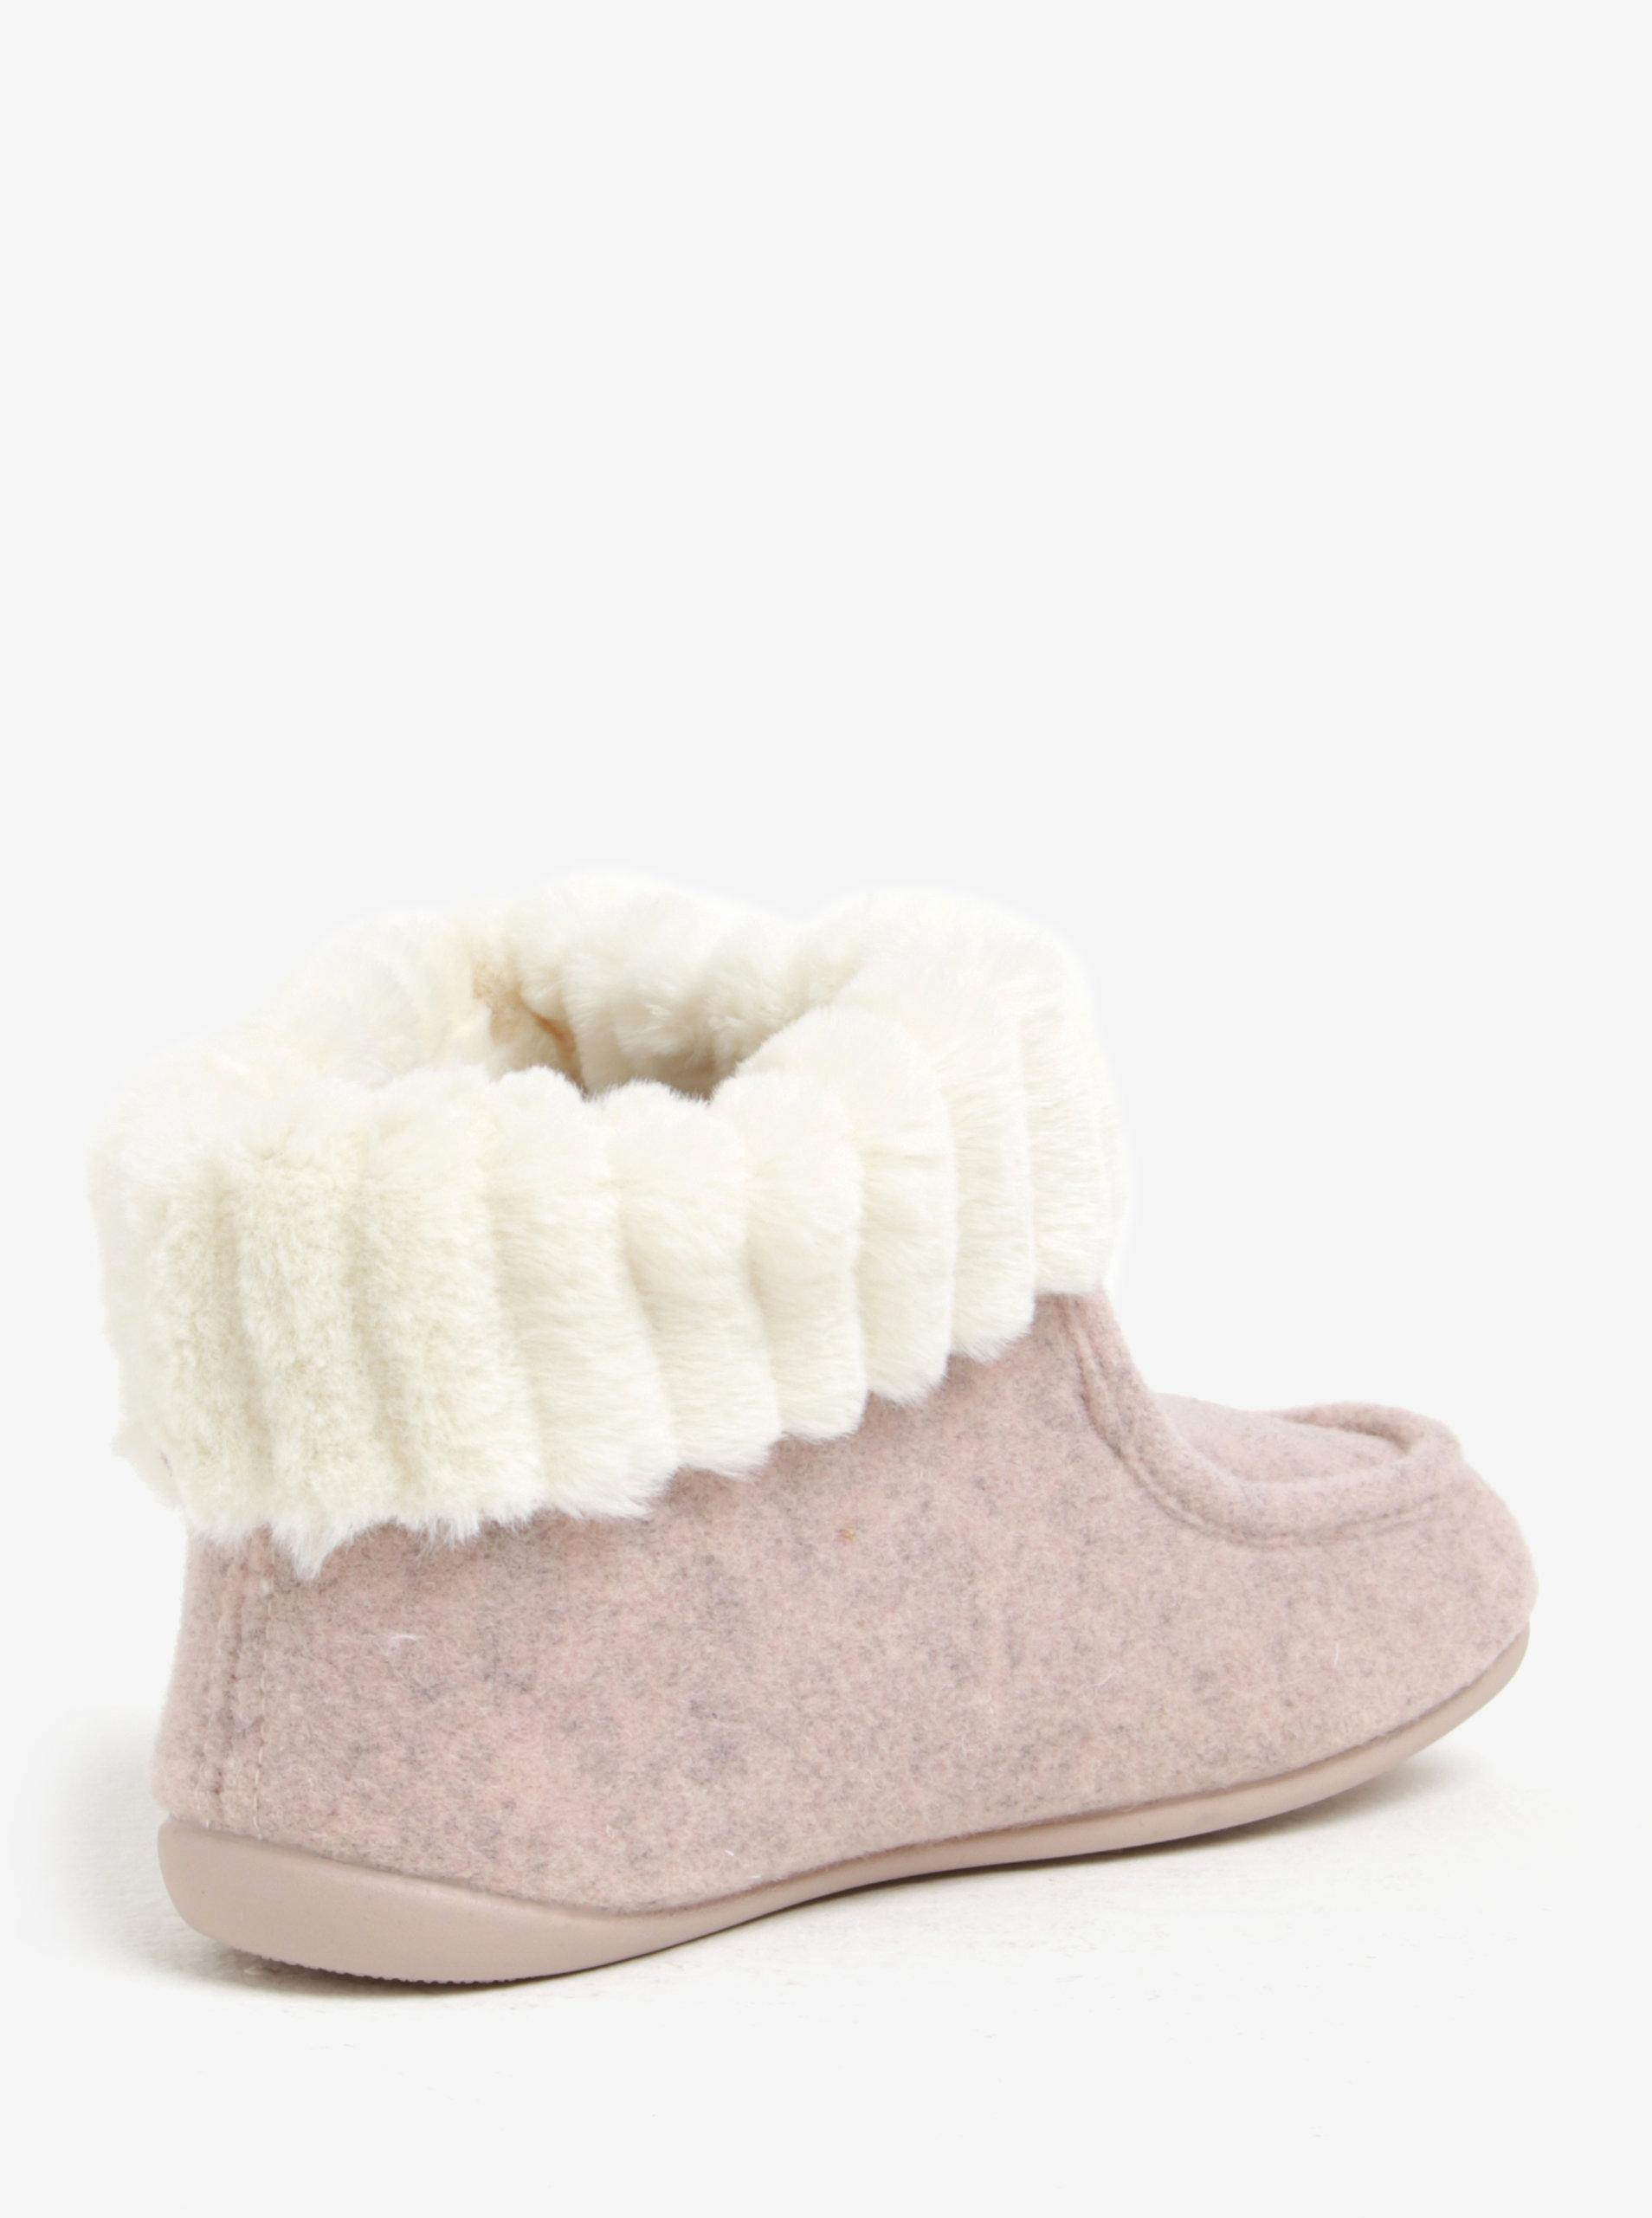 3deae08286747 Ružové dámske papuče s umelou kožušinou OJJU | ZOOT.sk